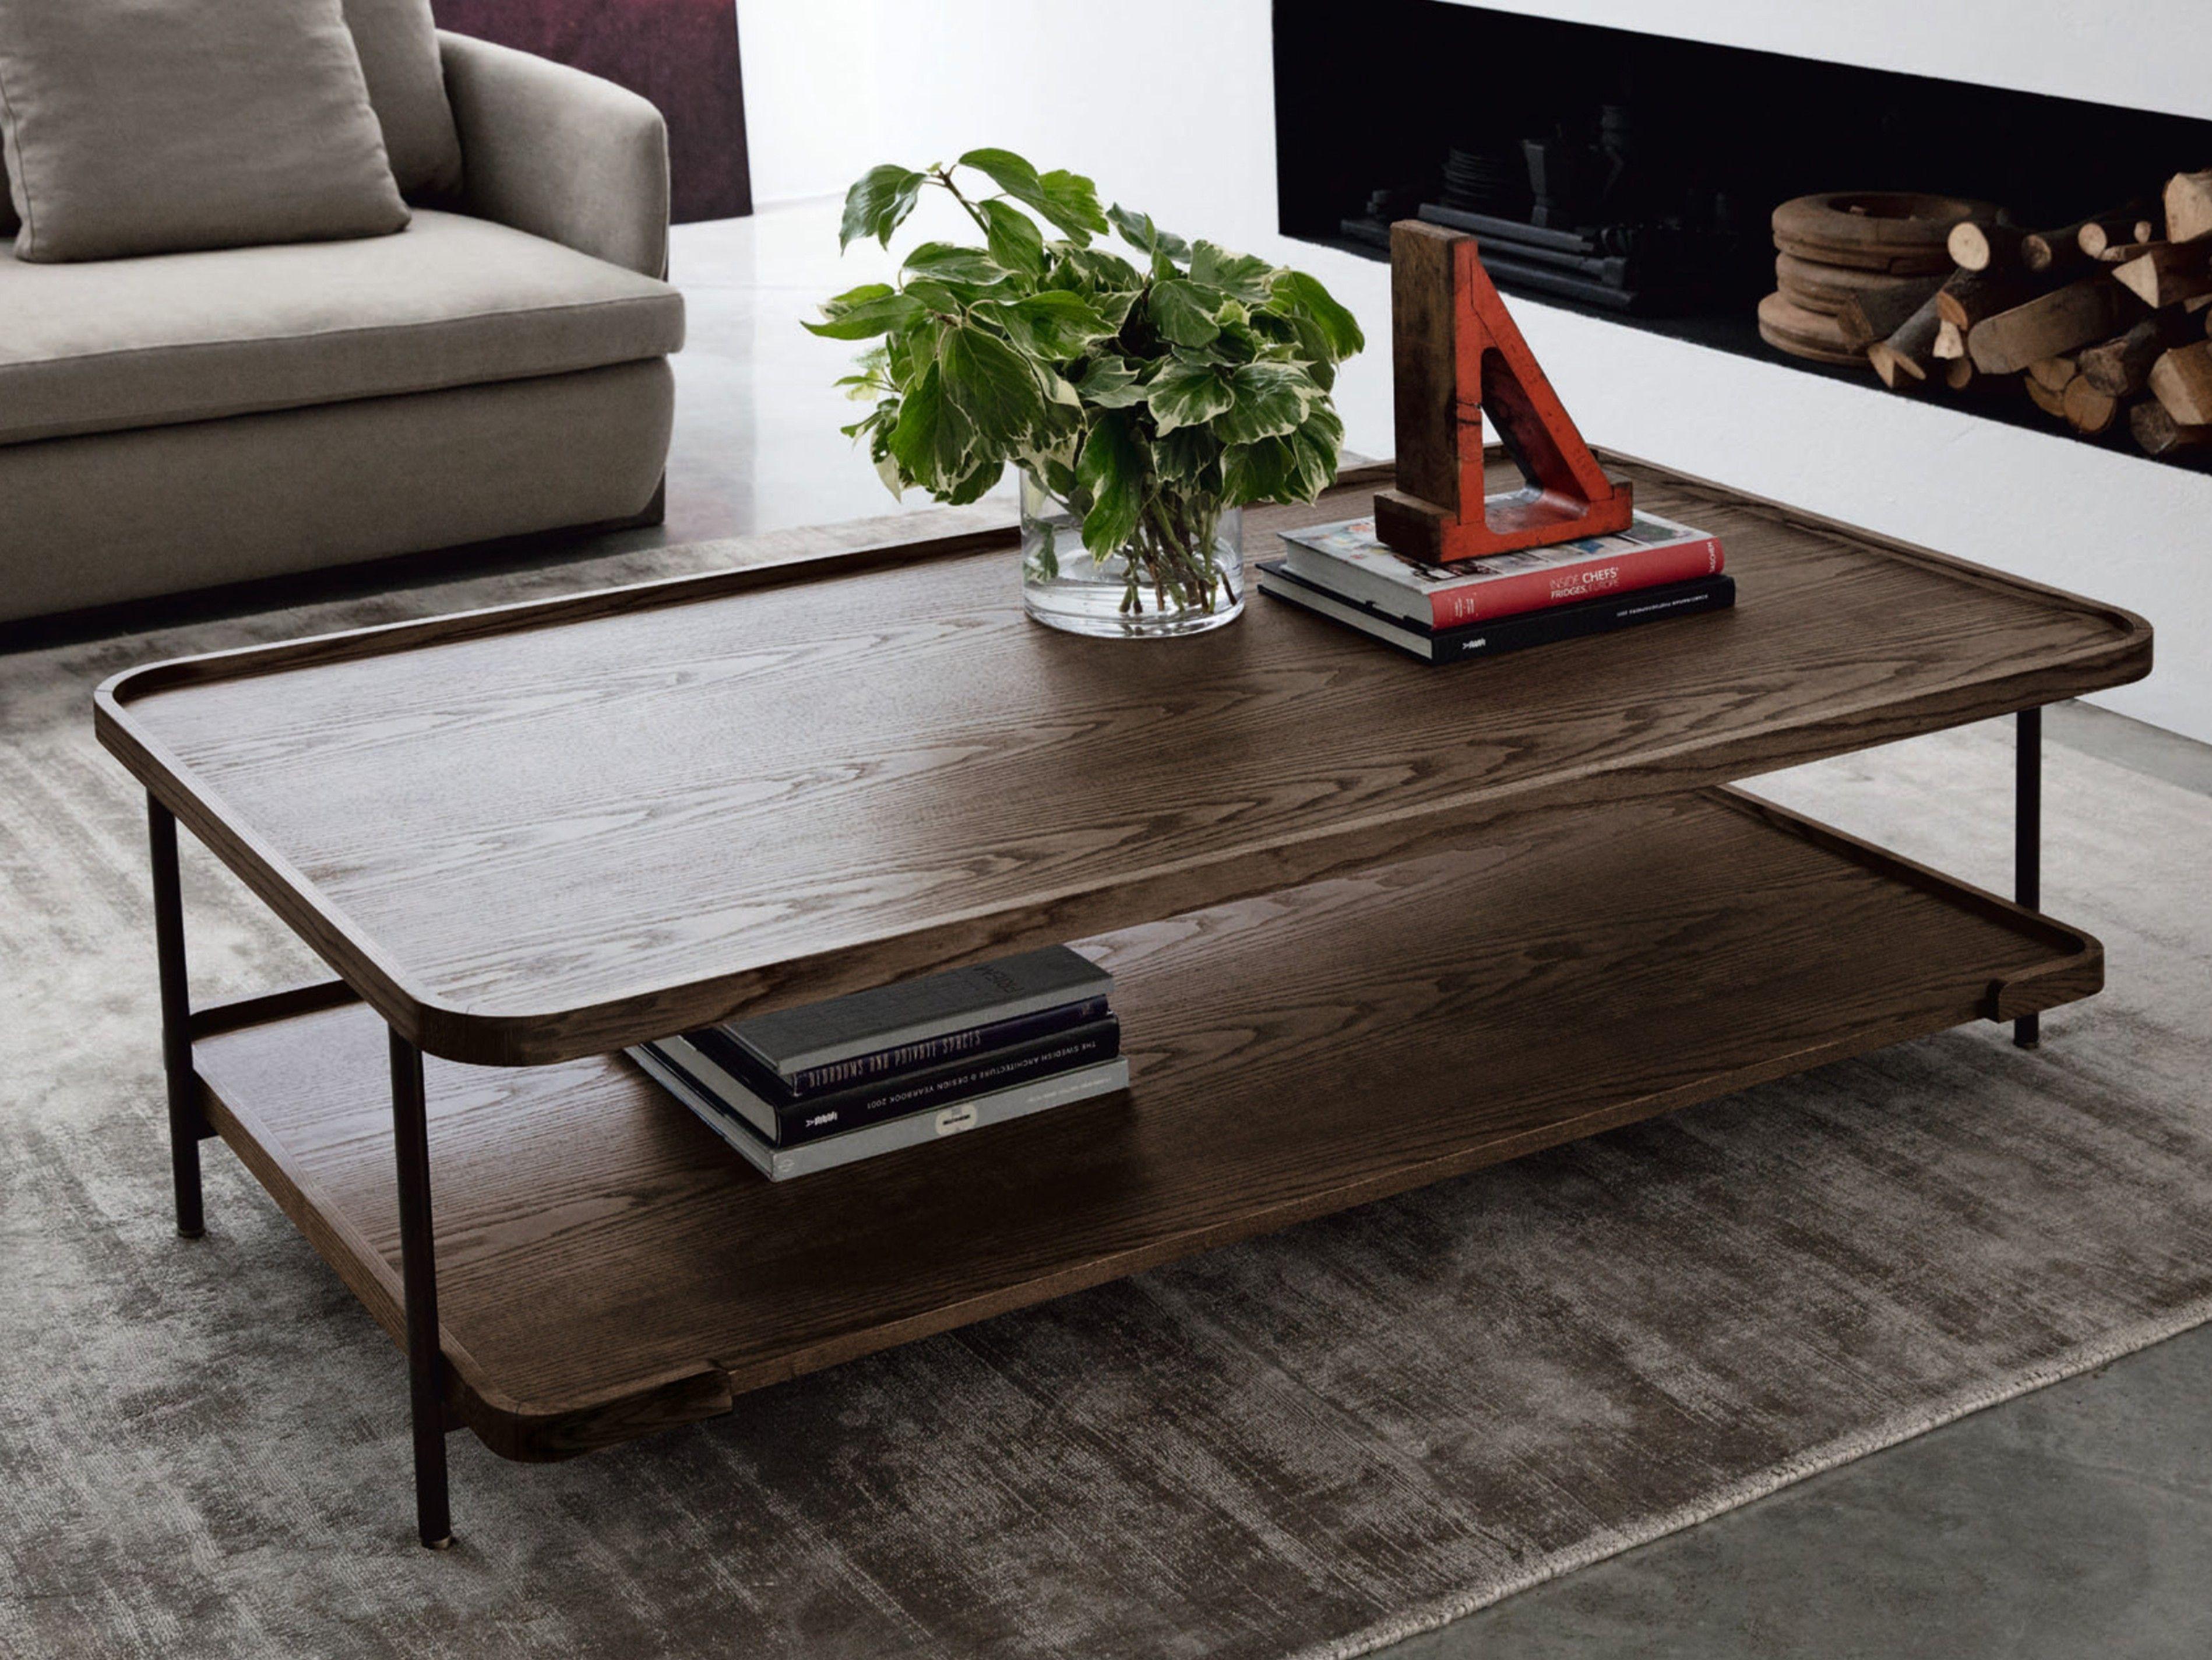 Koster Rectangular Coffee Table By Porada Design Staffan Tollgard [ 2848 x 3796 Pixel ]